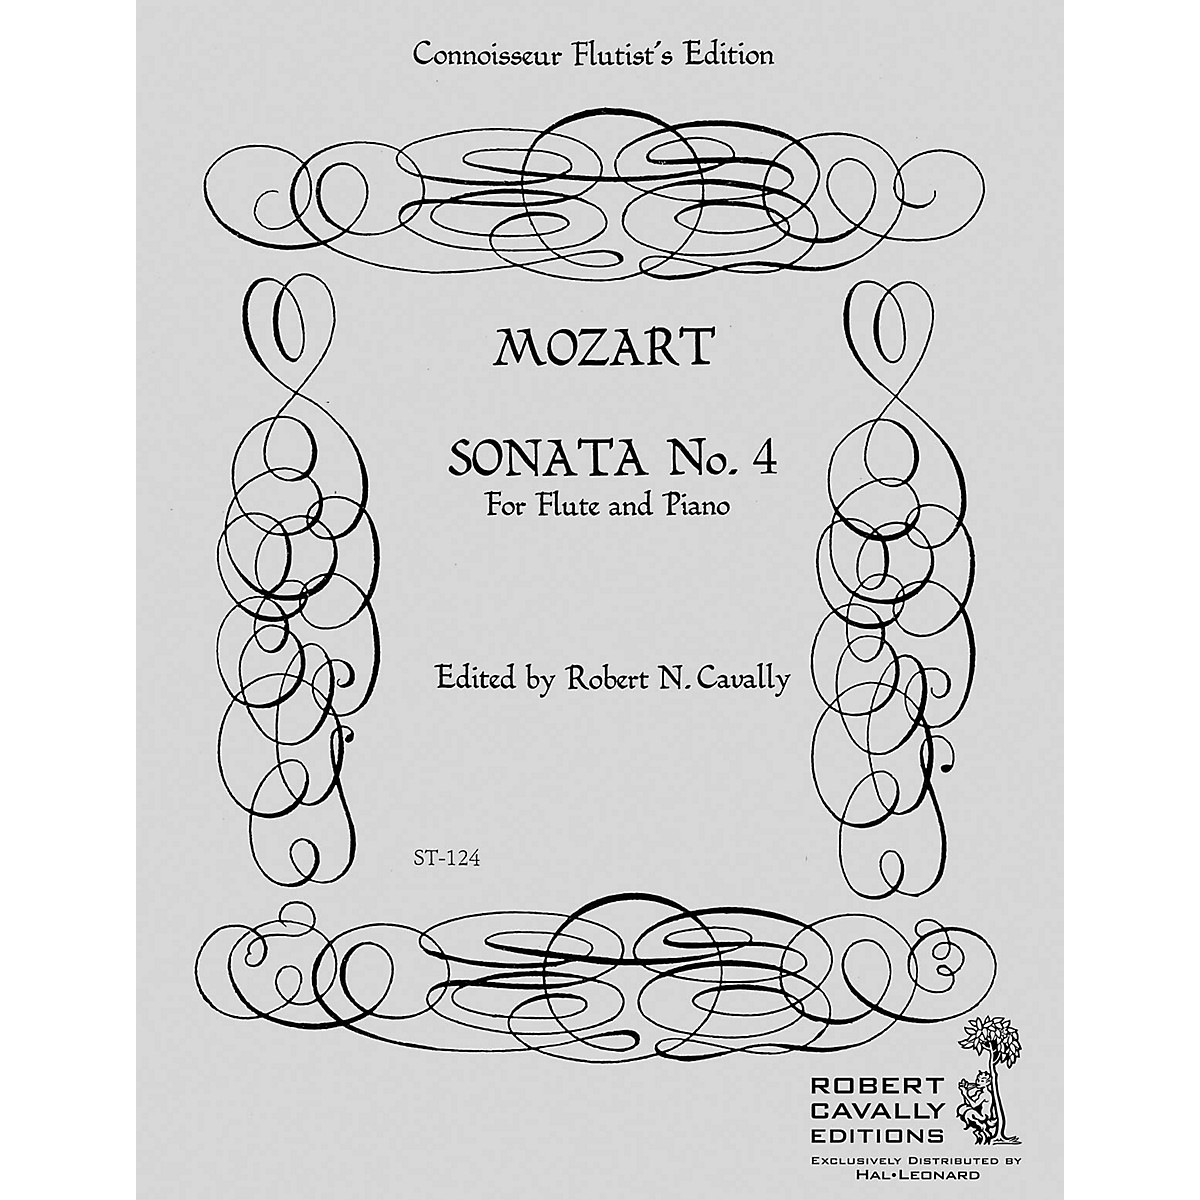 Cavally Editions Sonata No. 4 in F (Connoisseur Flutist's Edition) Robert Cavally Editions Series by Robert Cavally